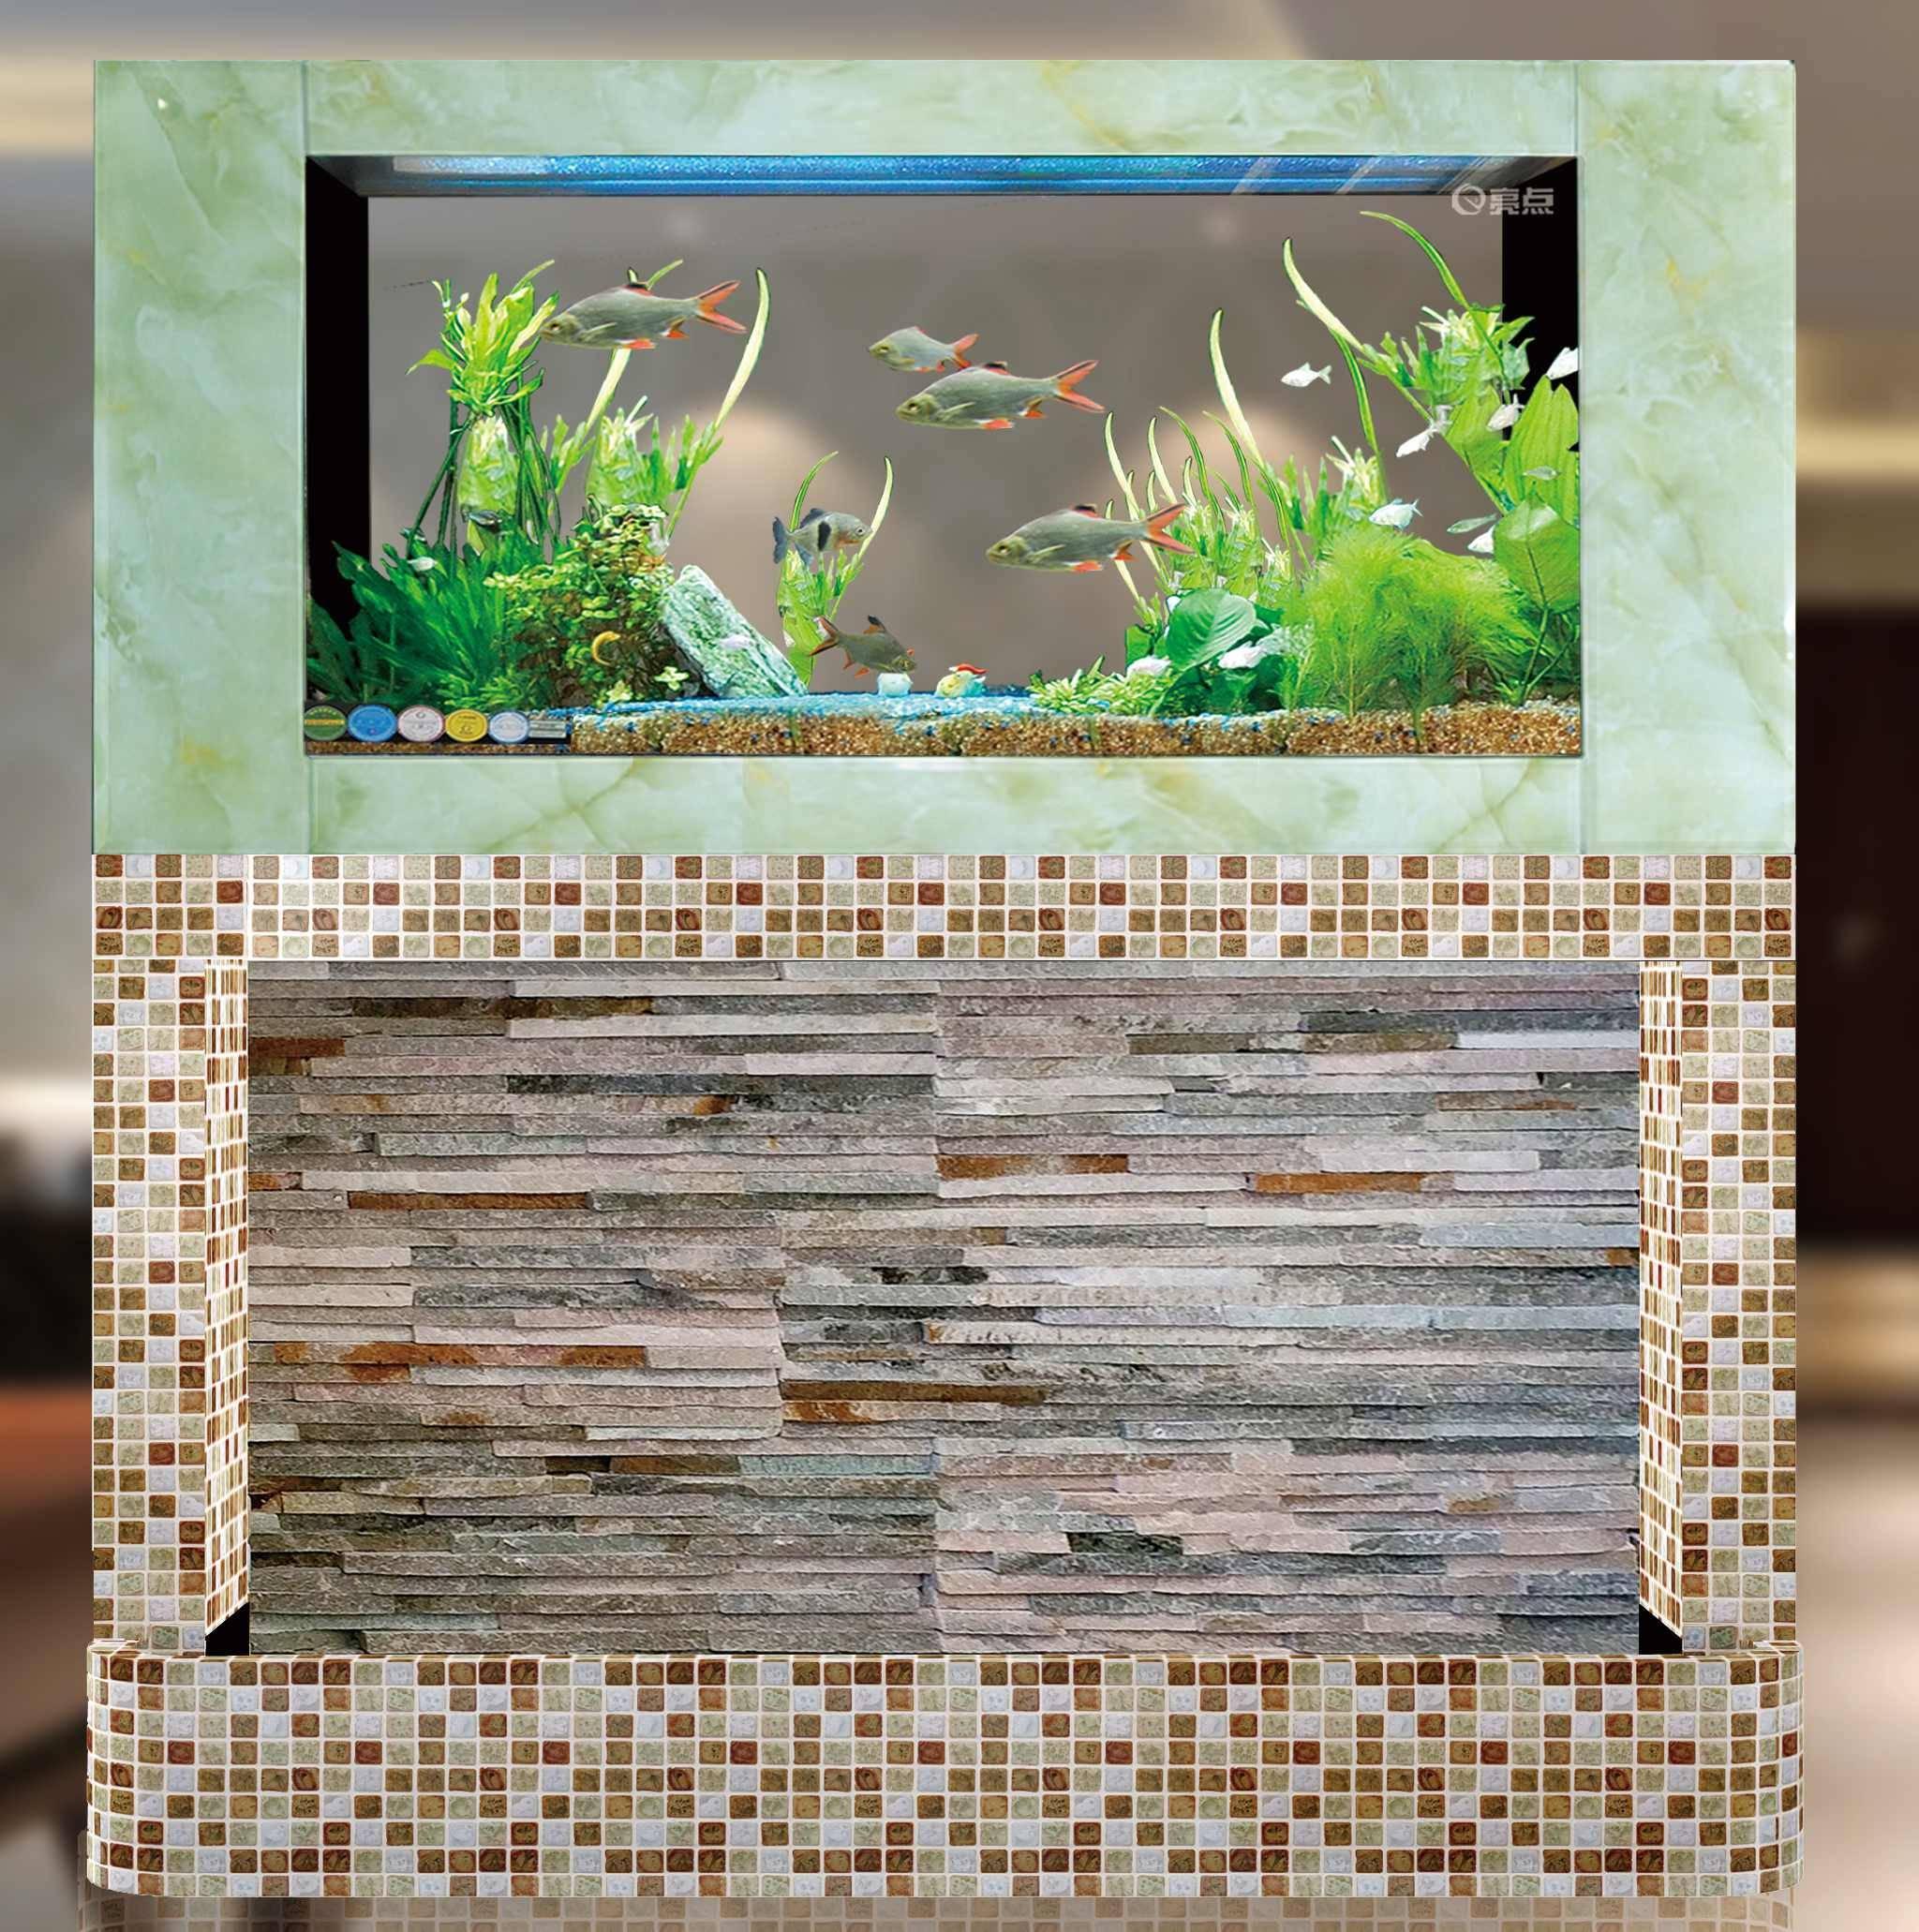 Ceramic flowers mosaic + jade grain glsss waterfall